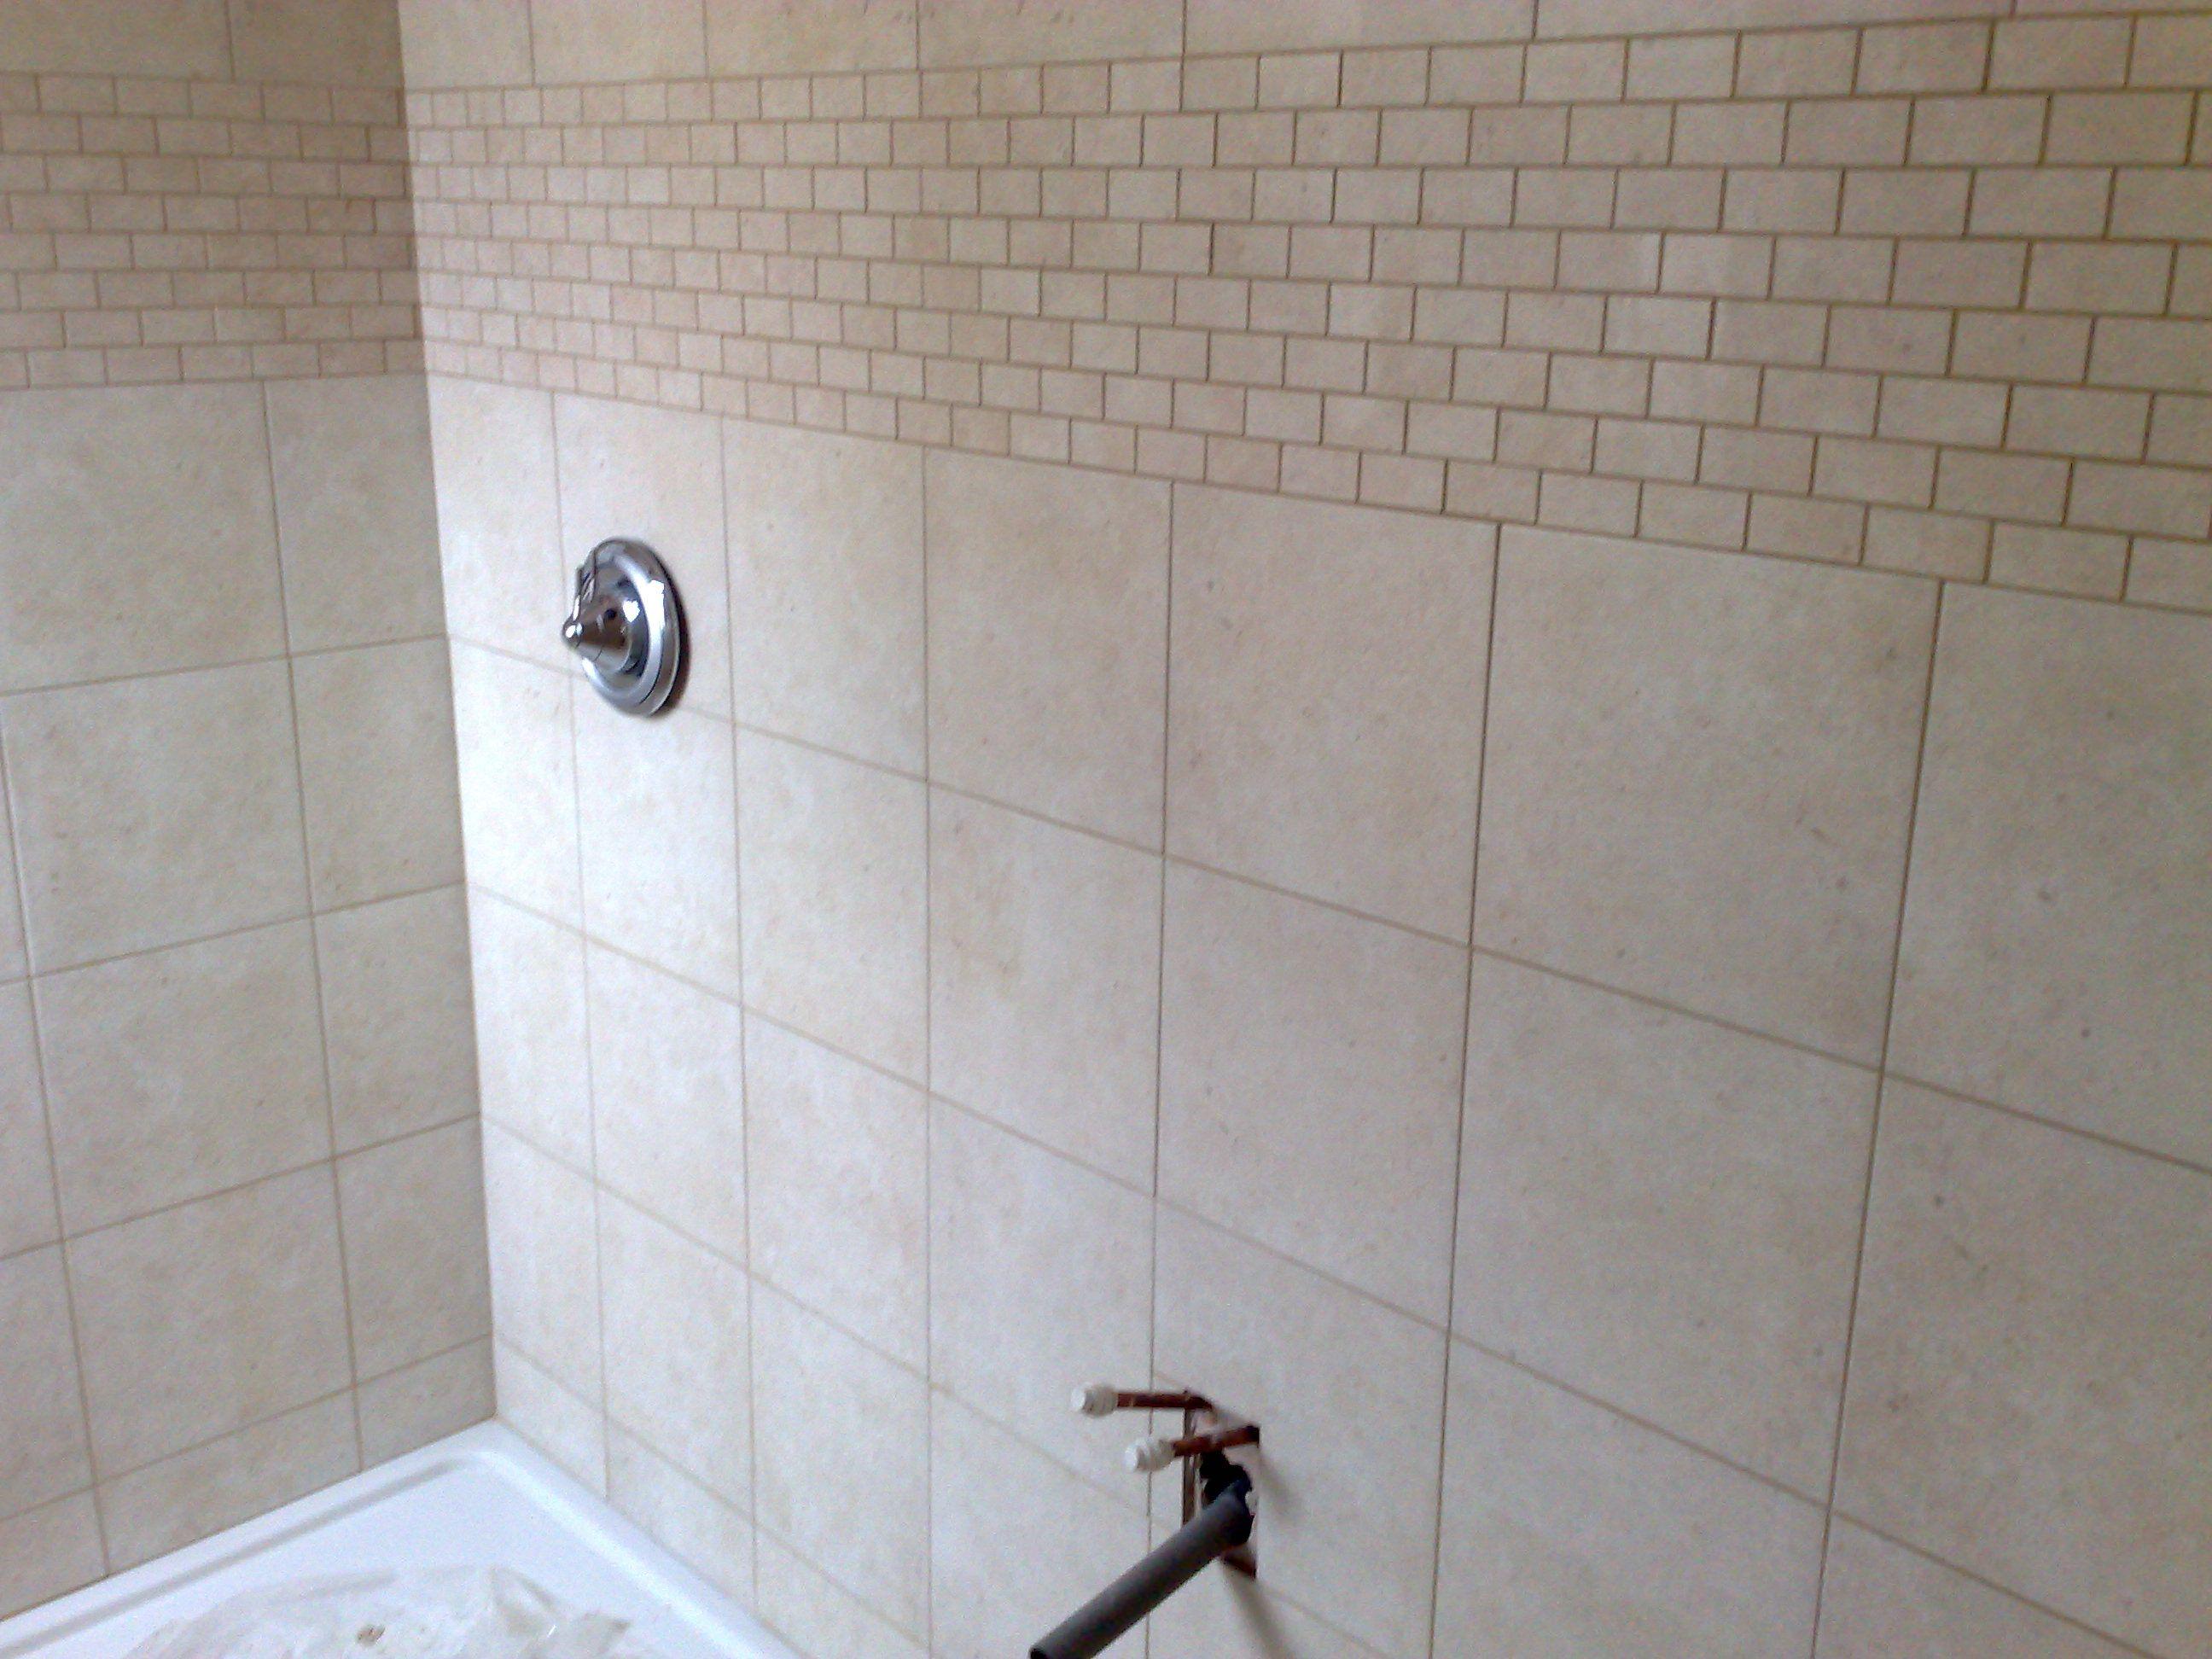 floor tiling, wall tiling, | Home | Pinterest | Wall tiles, Wet ...